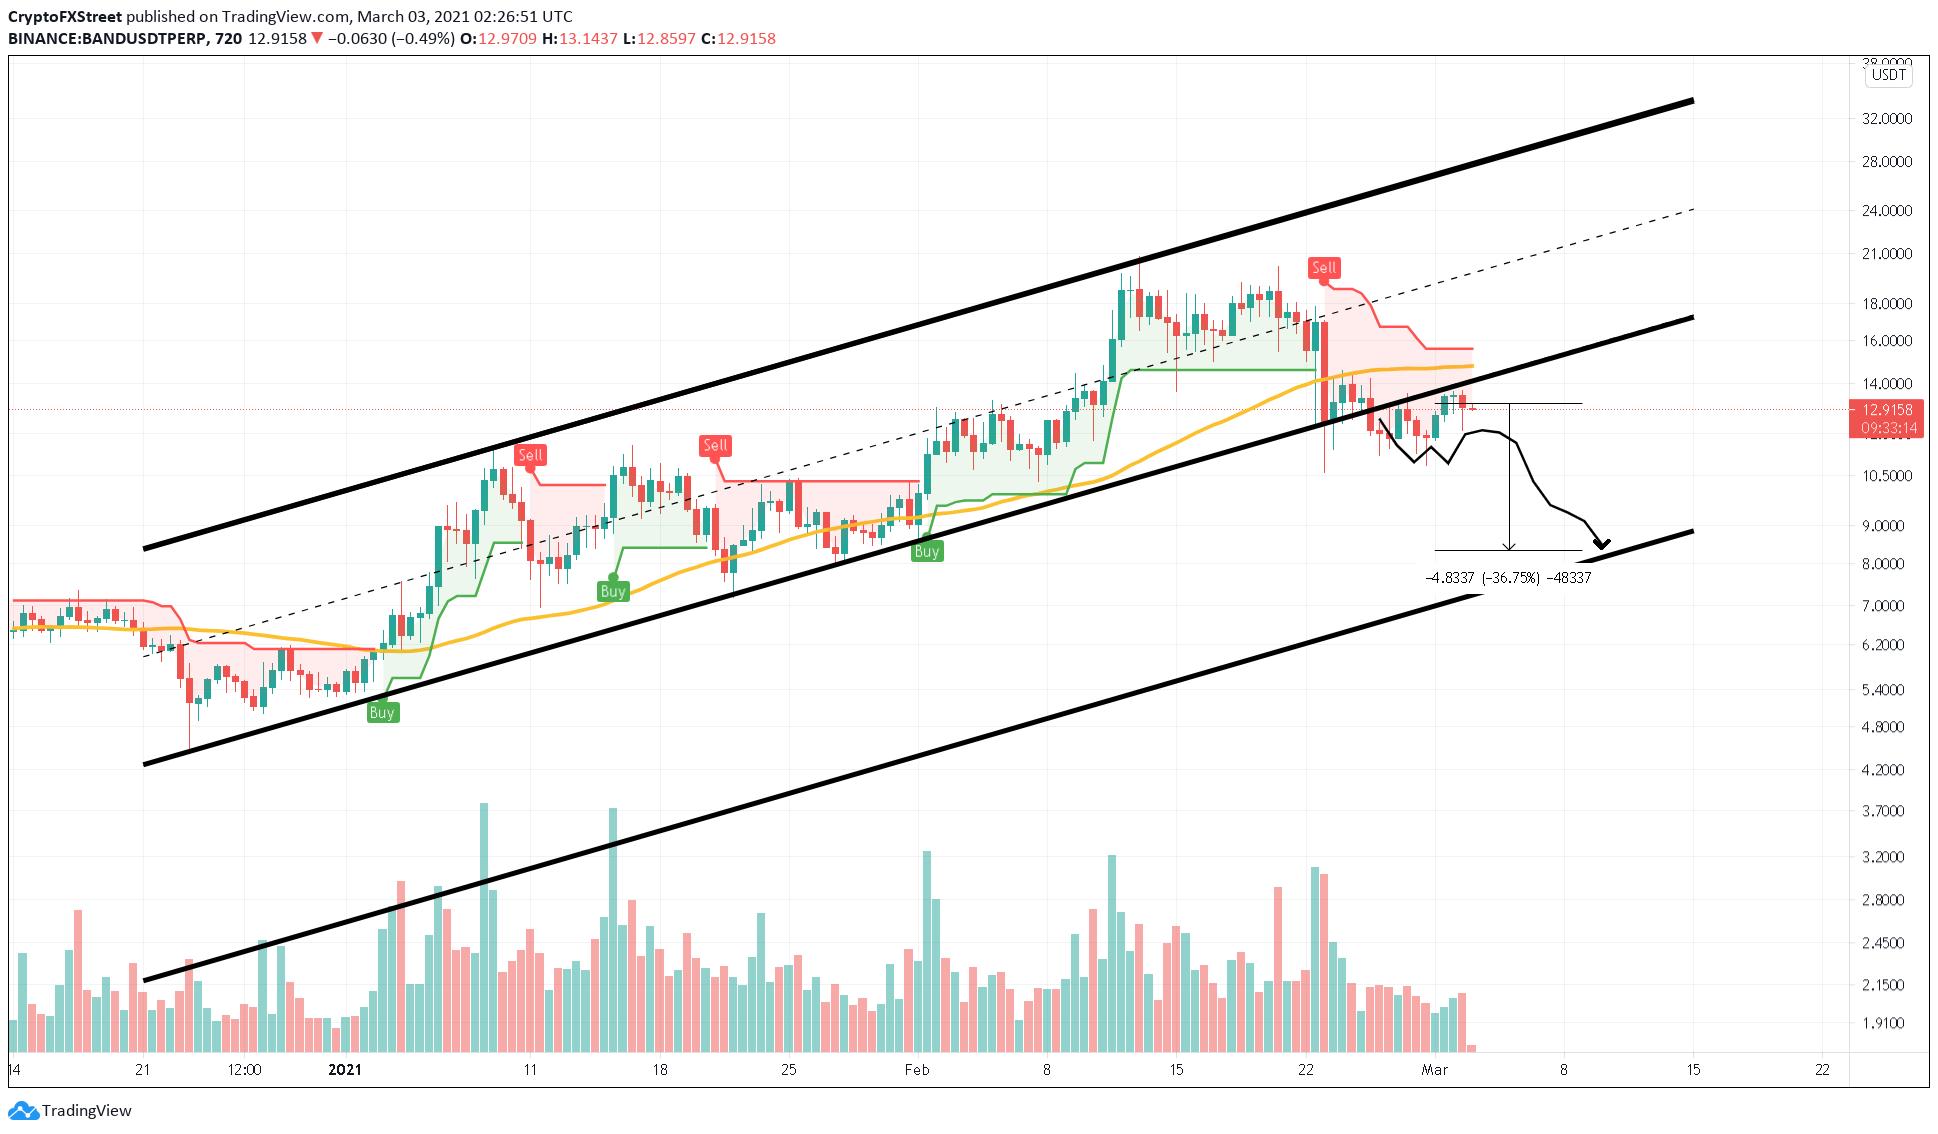 BAND/USDT 12-hour chart